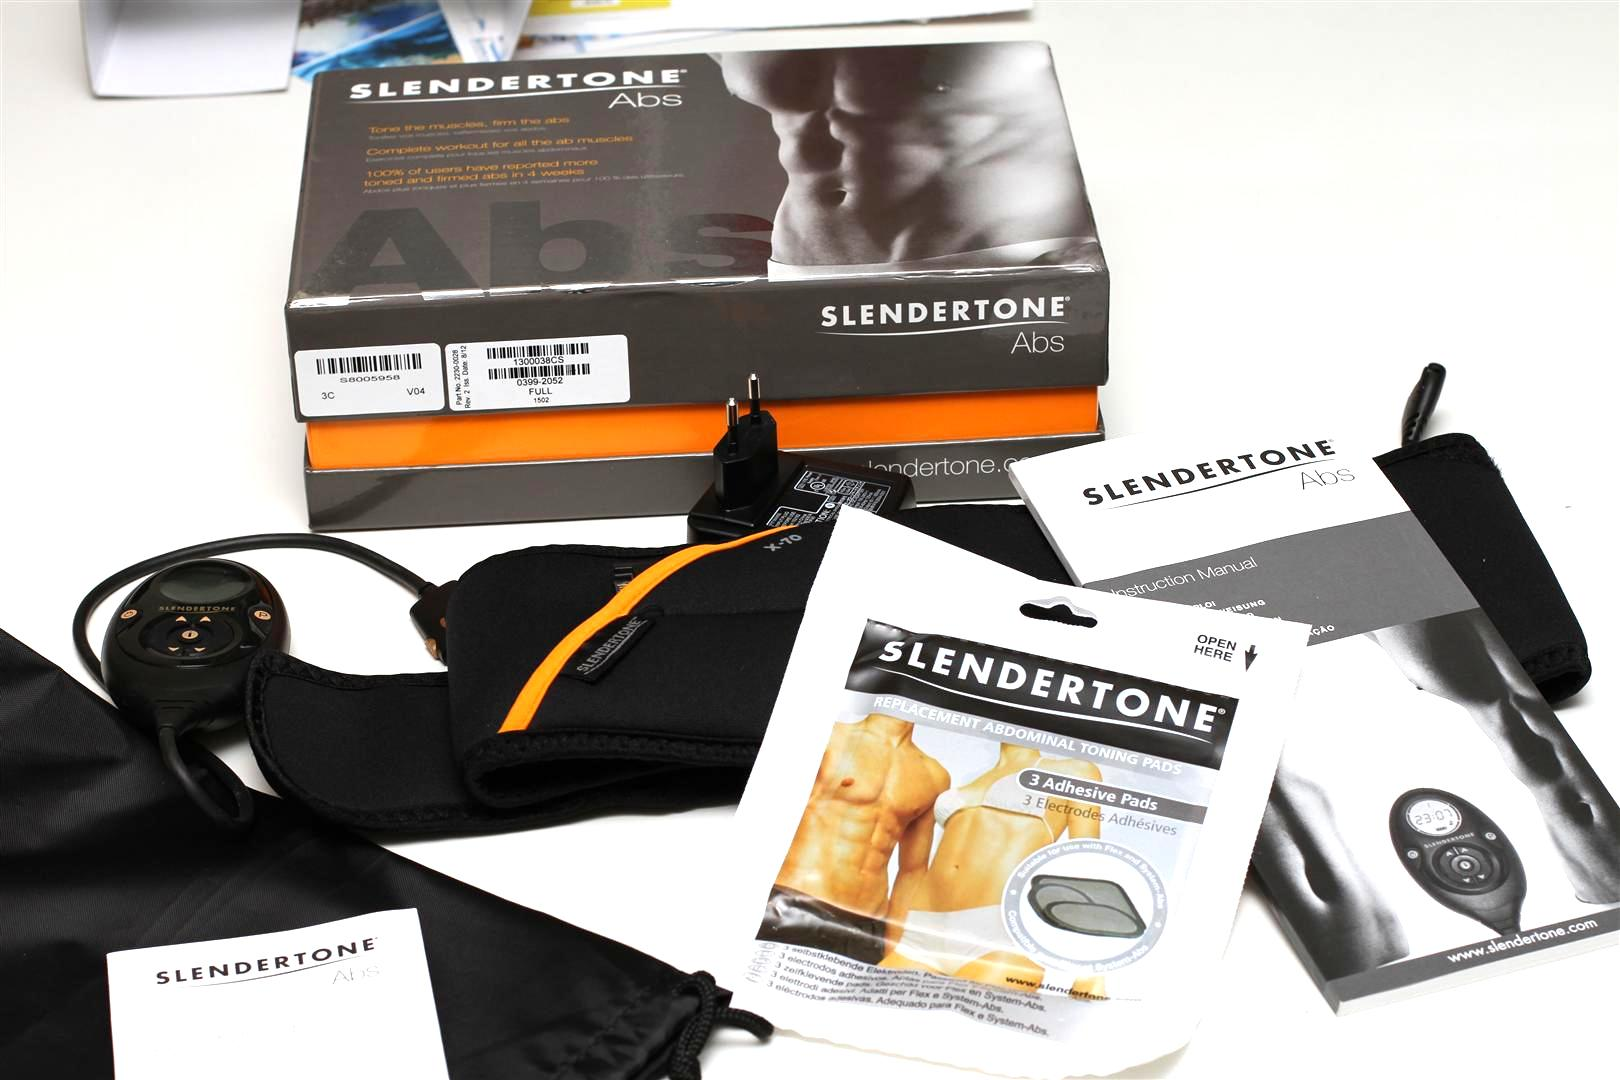 slenderstone - abs test